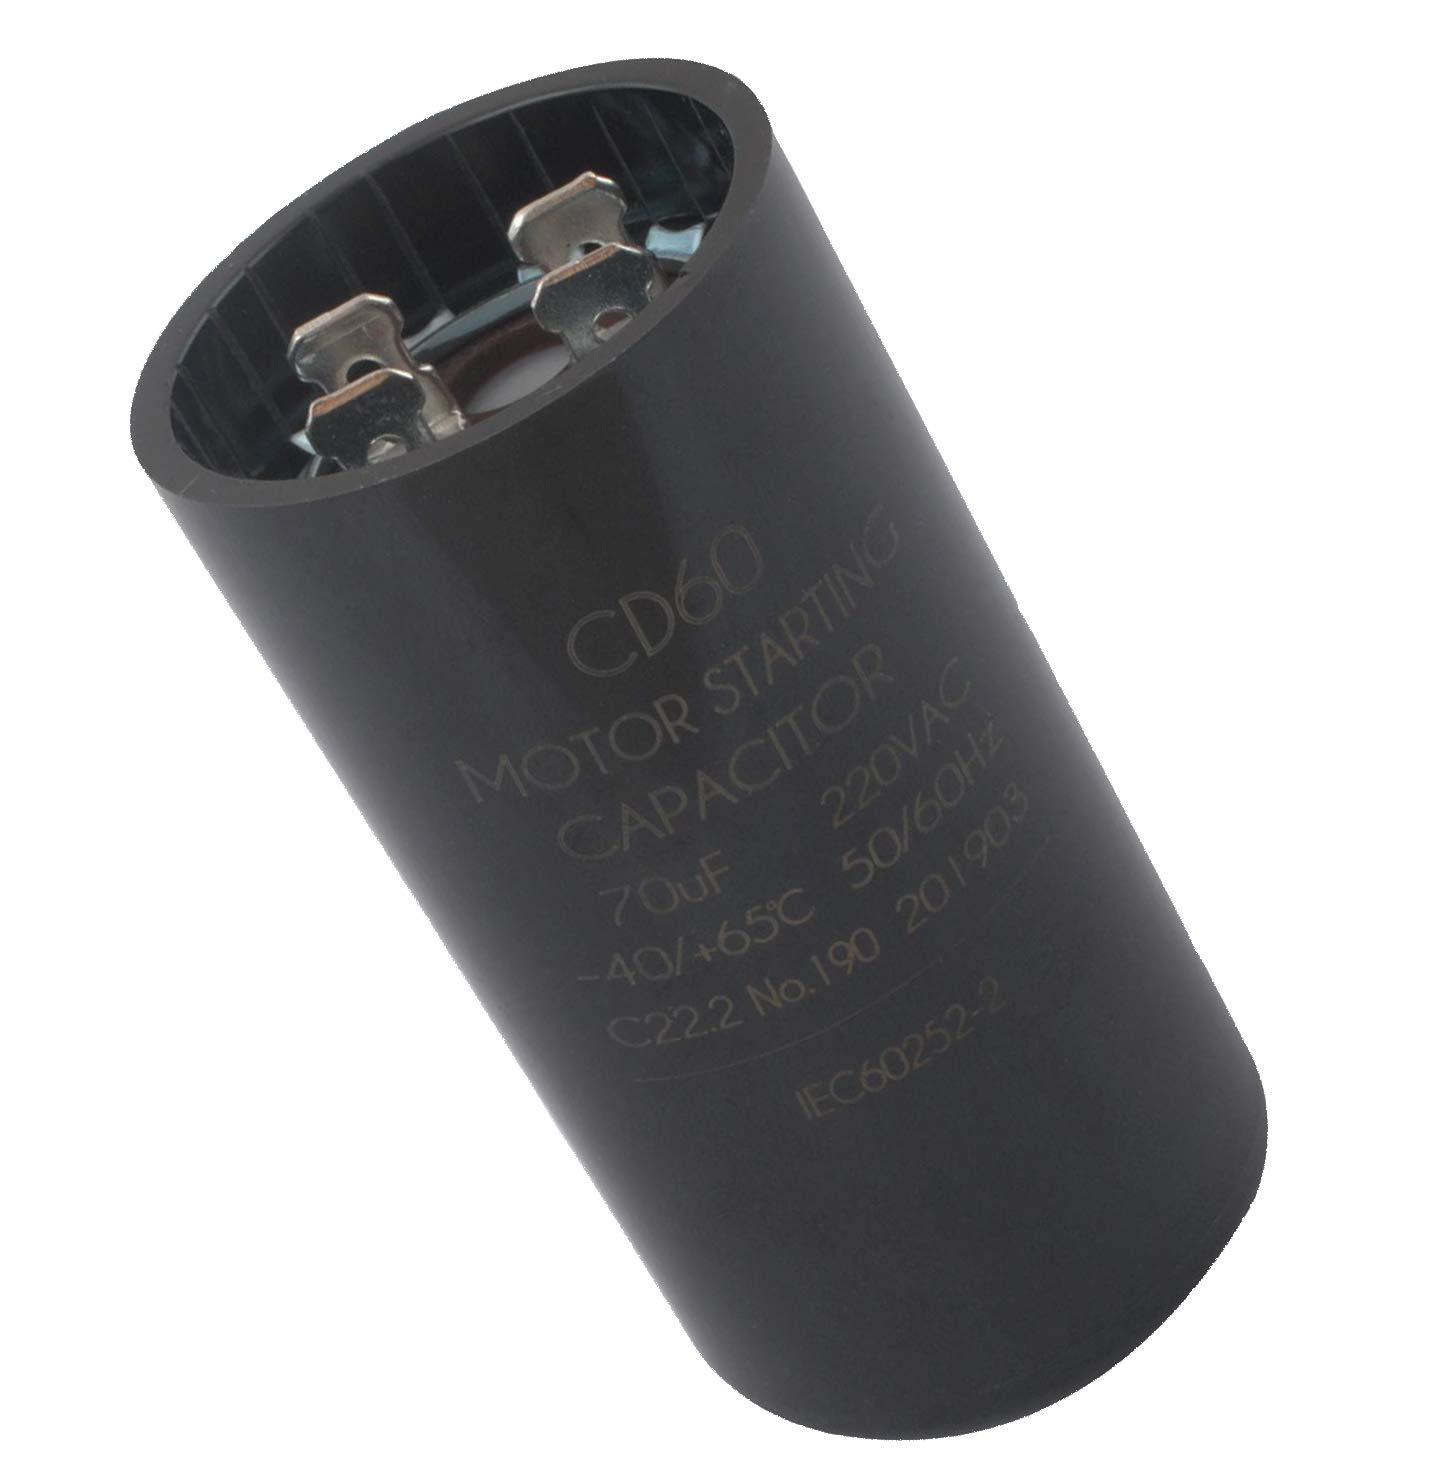 19988A Capacitor Garage Door Opener 70 Microfarad (MFD), 220 Volts AC (VAC), 60 Hertz (Hz) OEM Upgrade for Genie 19988A, 19988 and x-19988-a Garage Door Opener Capacitor